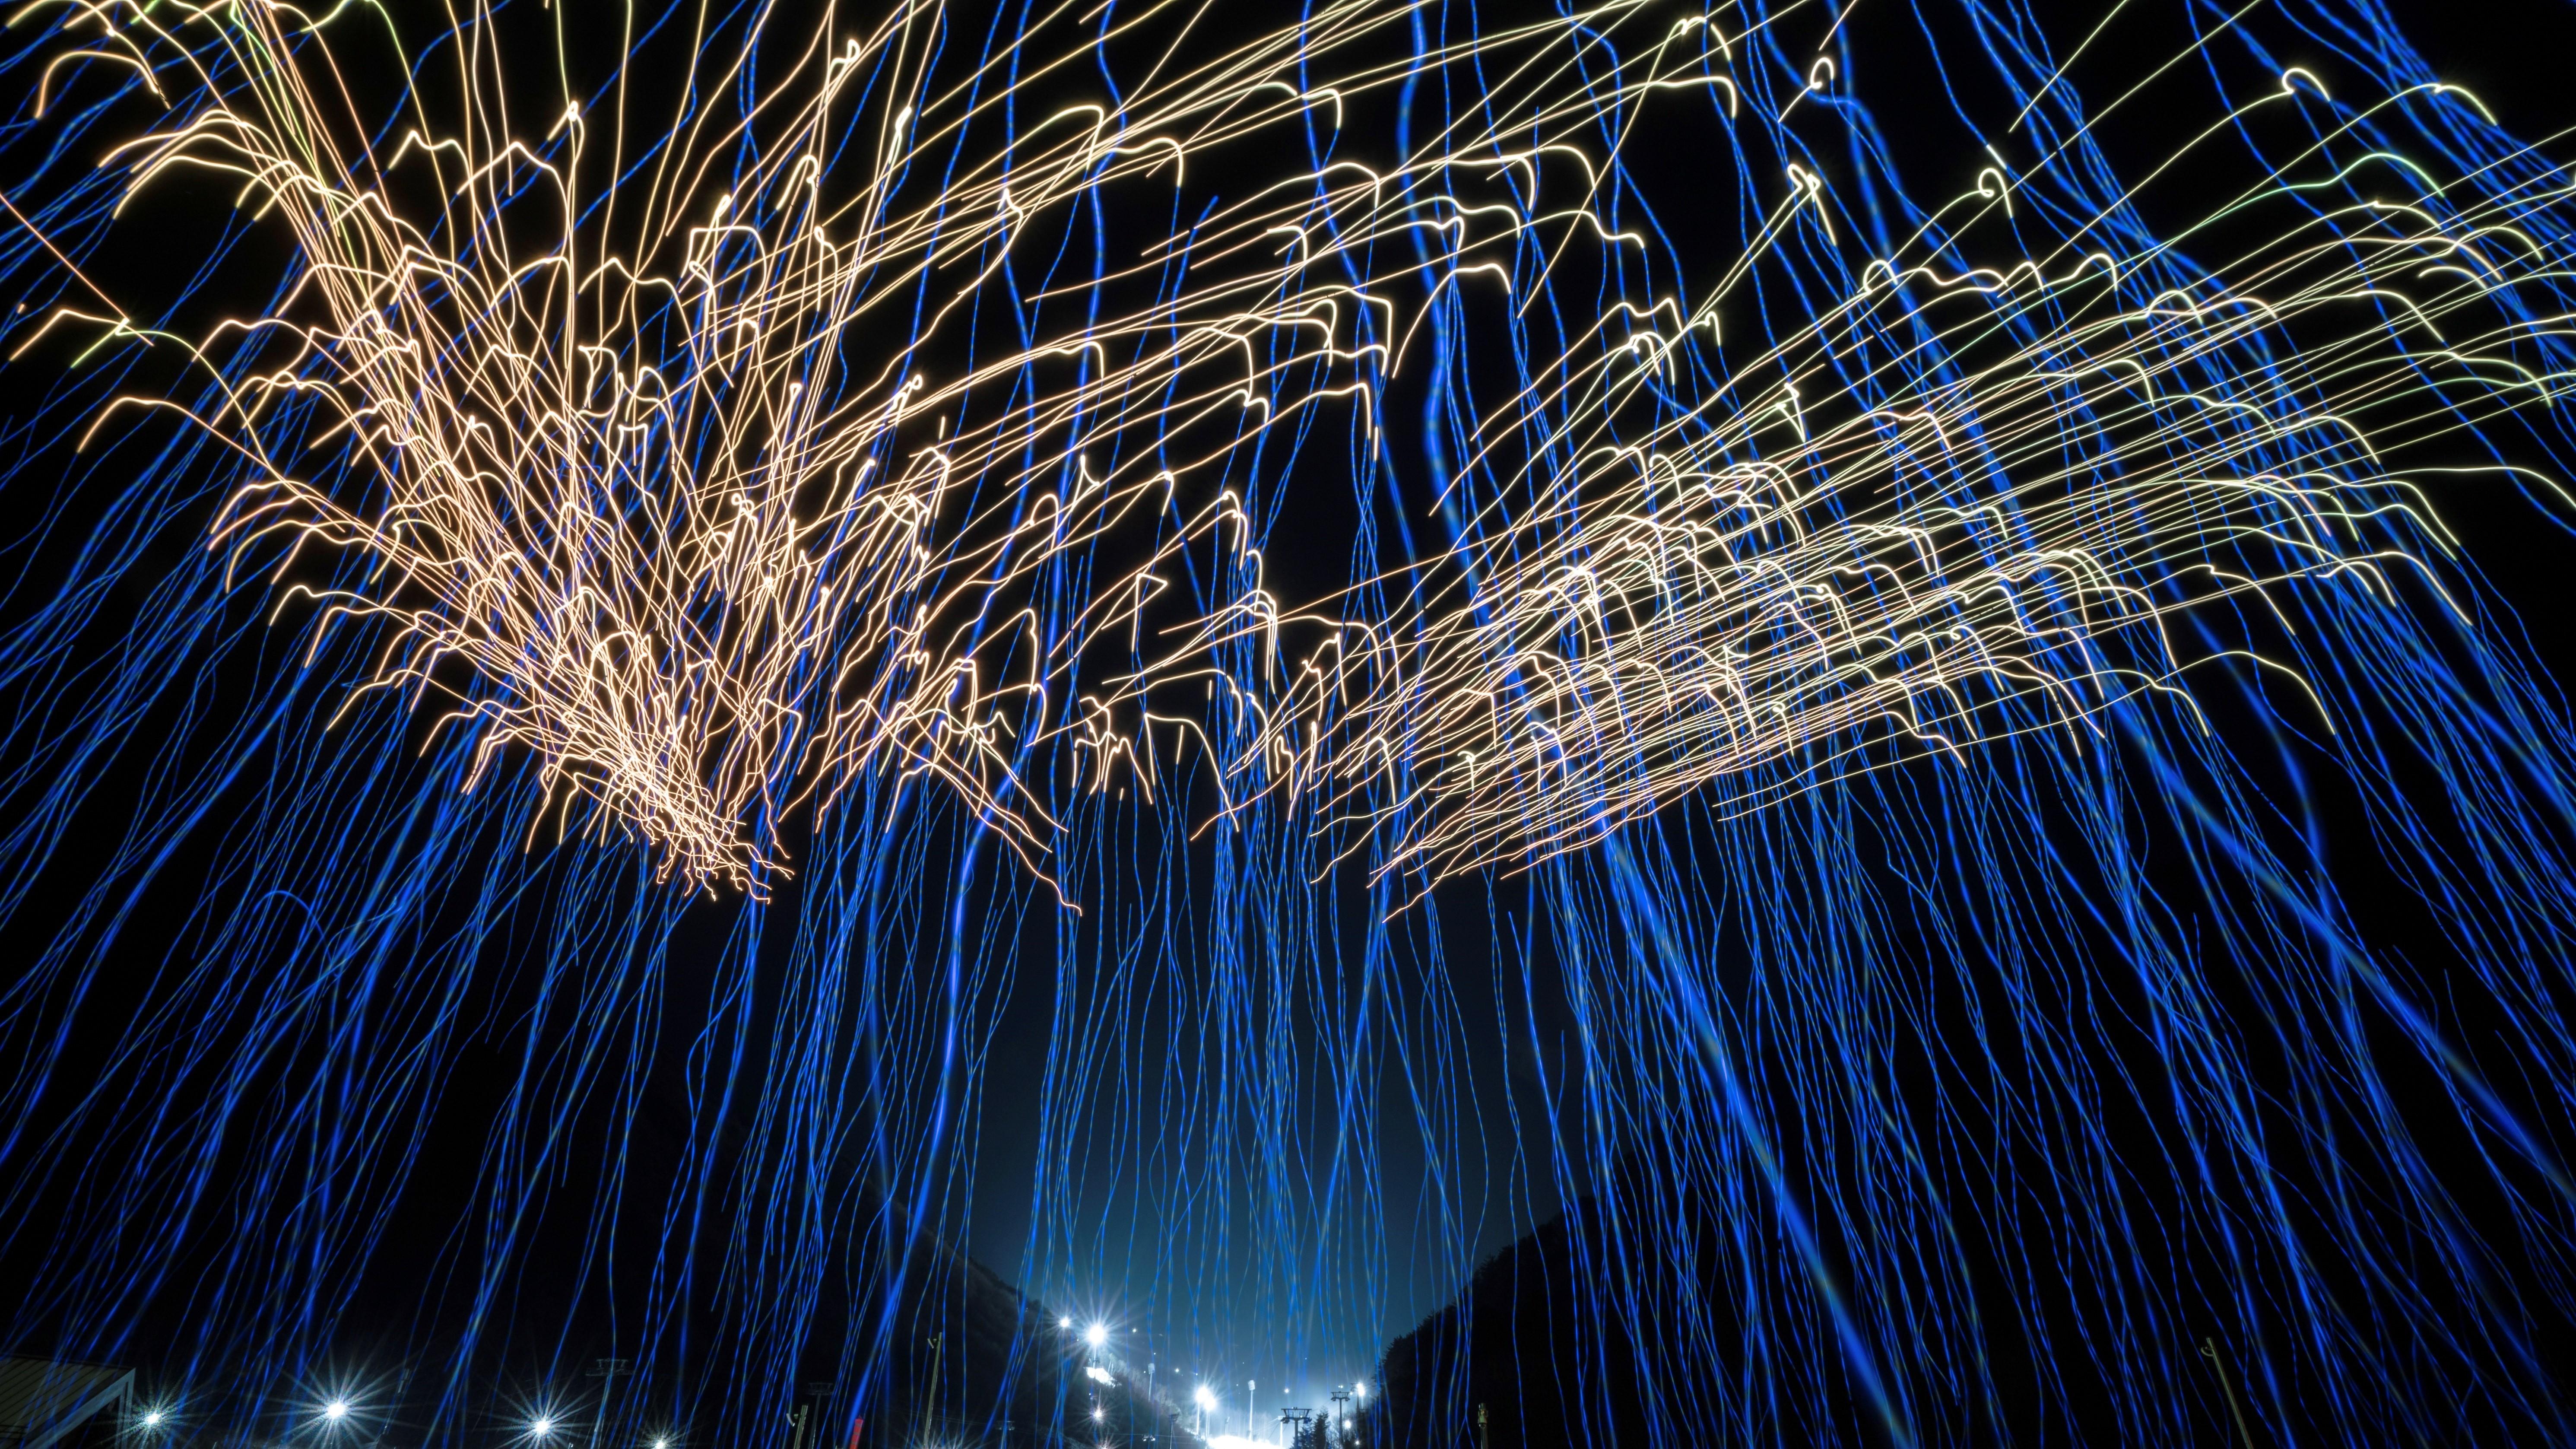 Intel-2018-Olympics-Drone-Ligh-Show-5